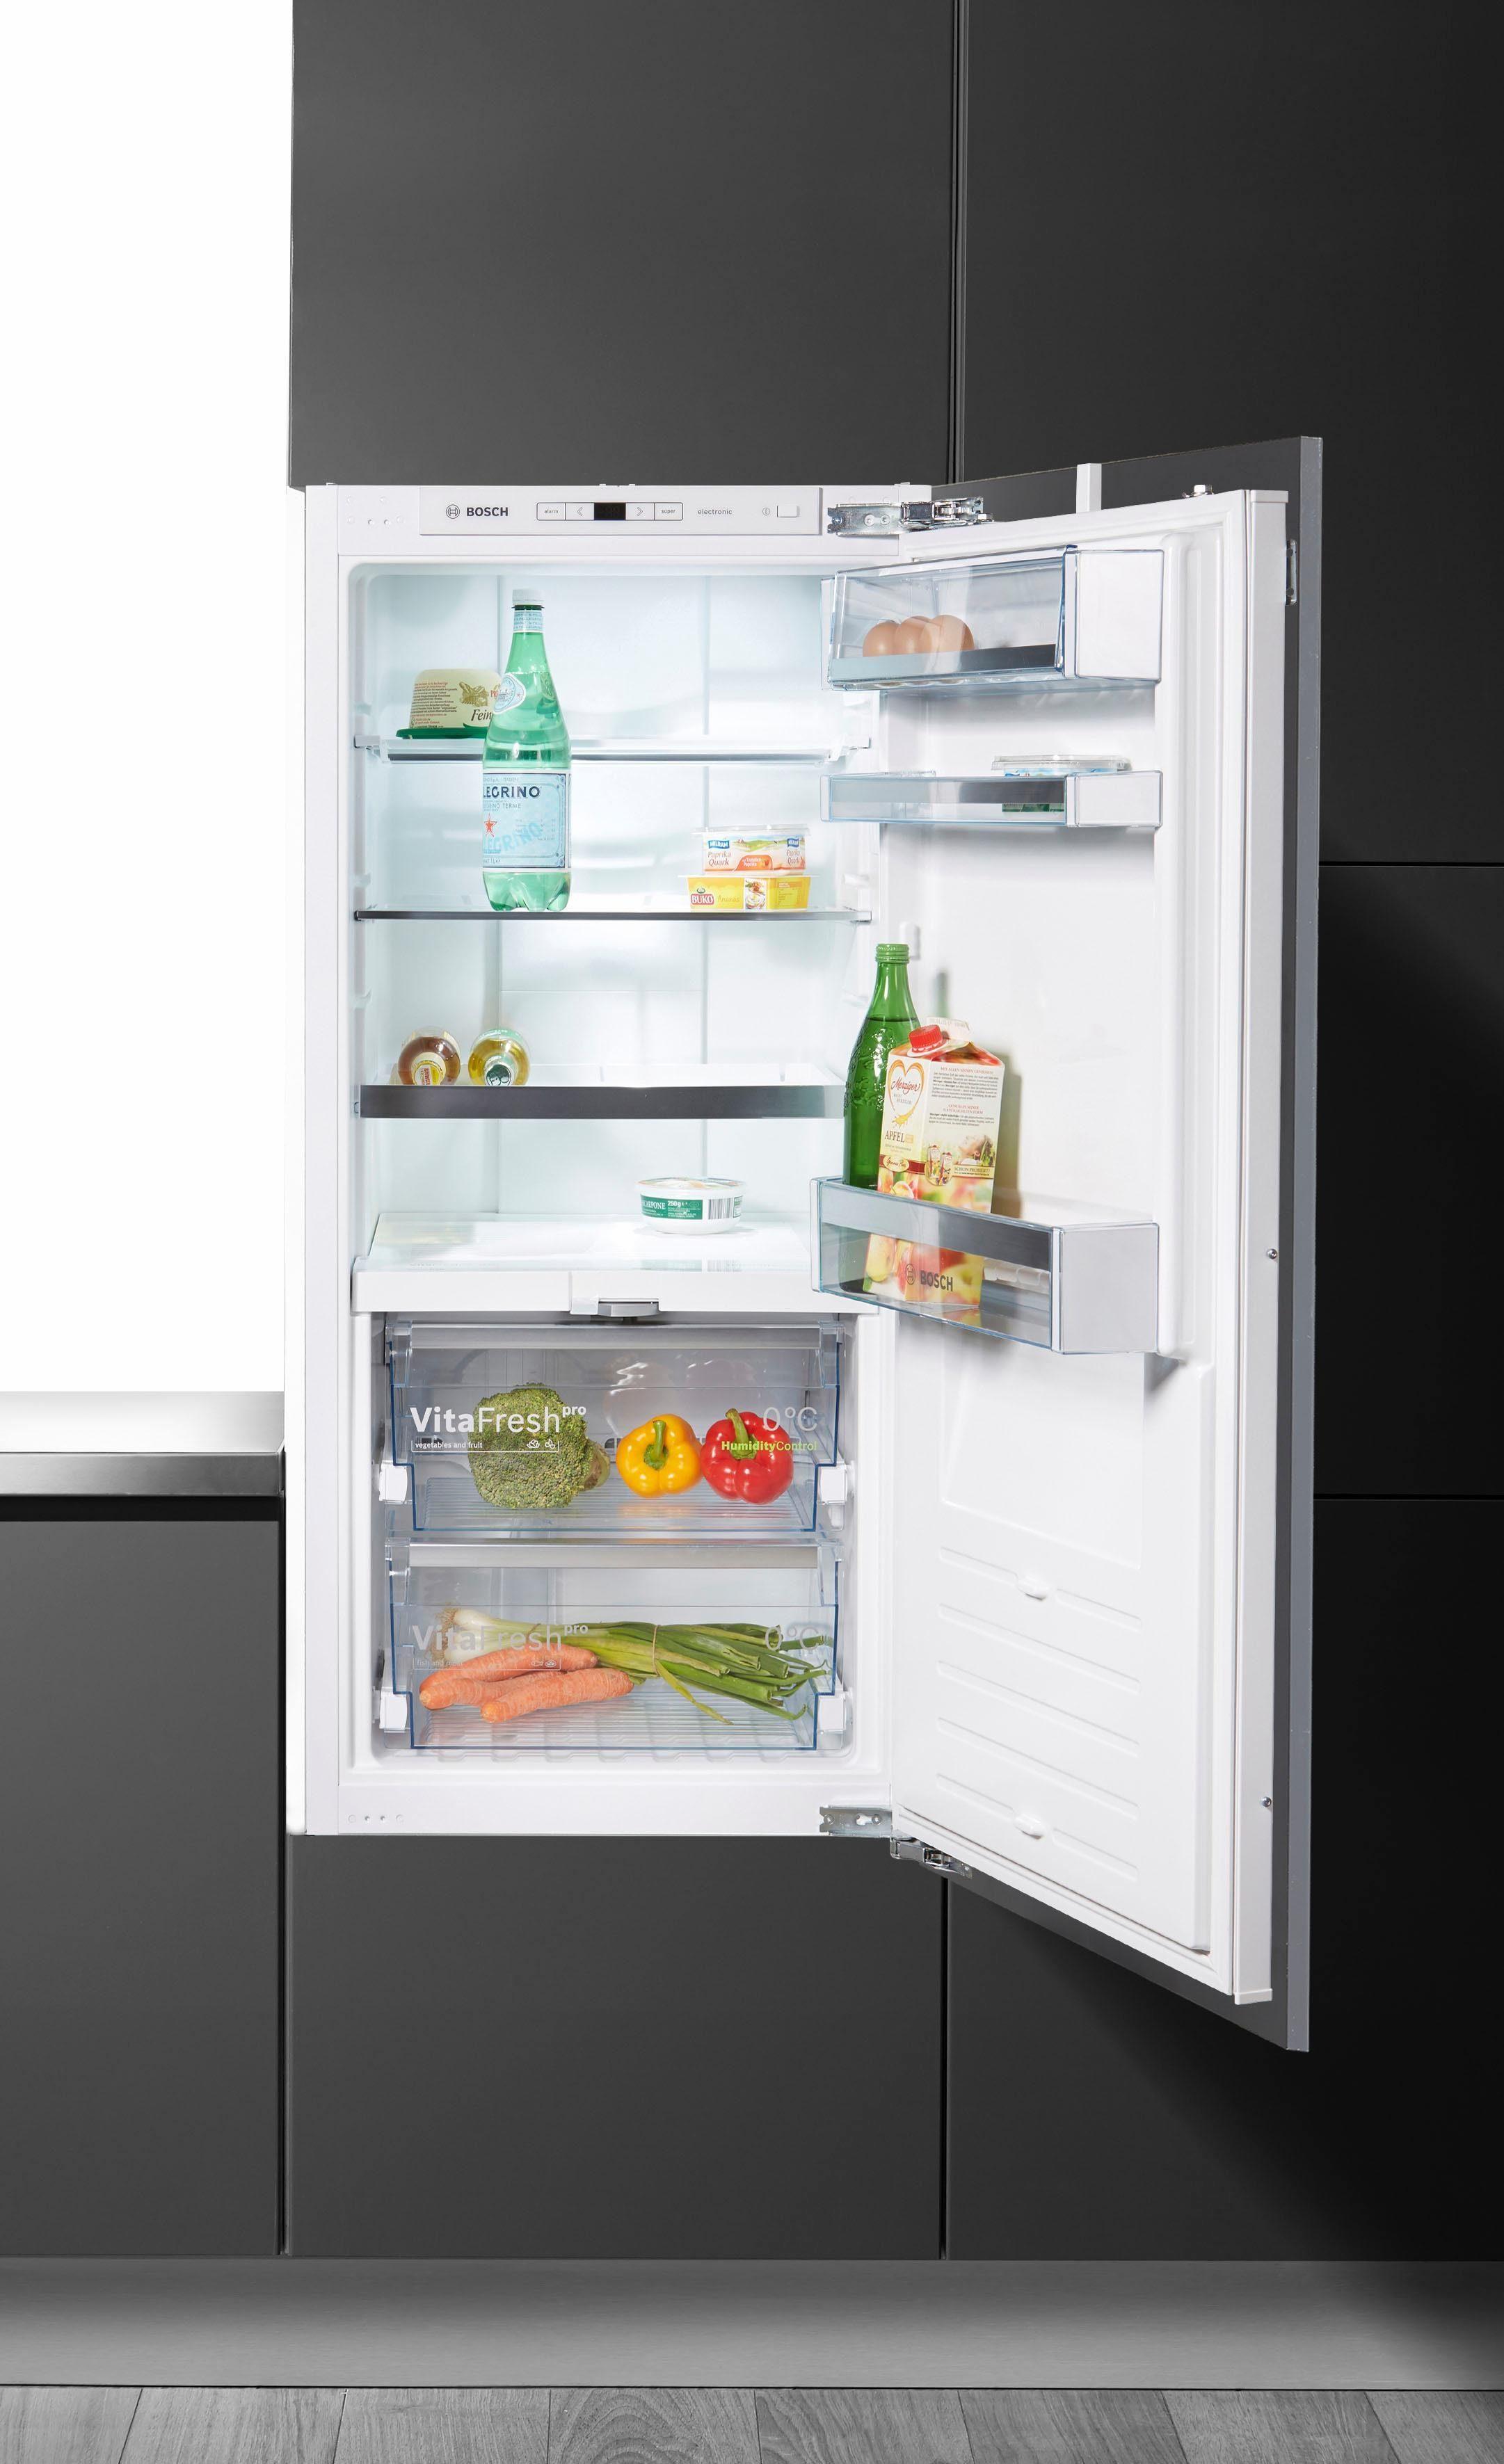 BOSCH Einbaukühlschrank KIF41AD40, 122,1 cm hoch, 55,8 cm breit, A+++, 122,1 cm